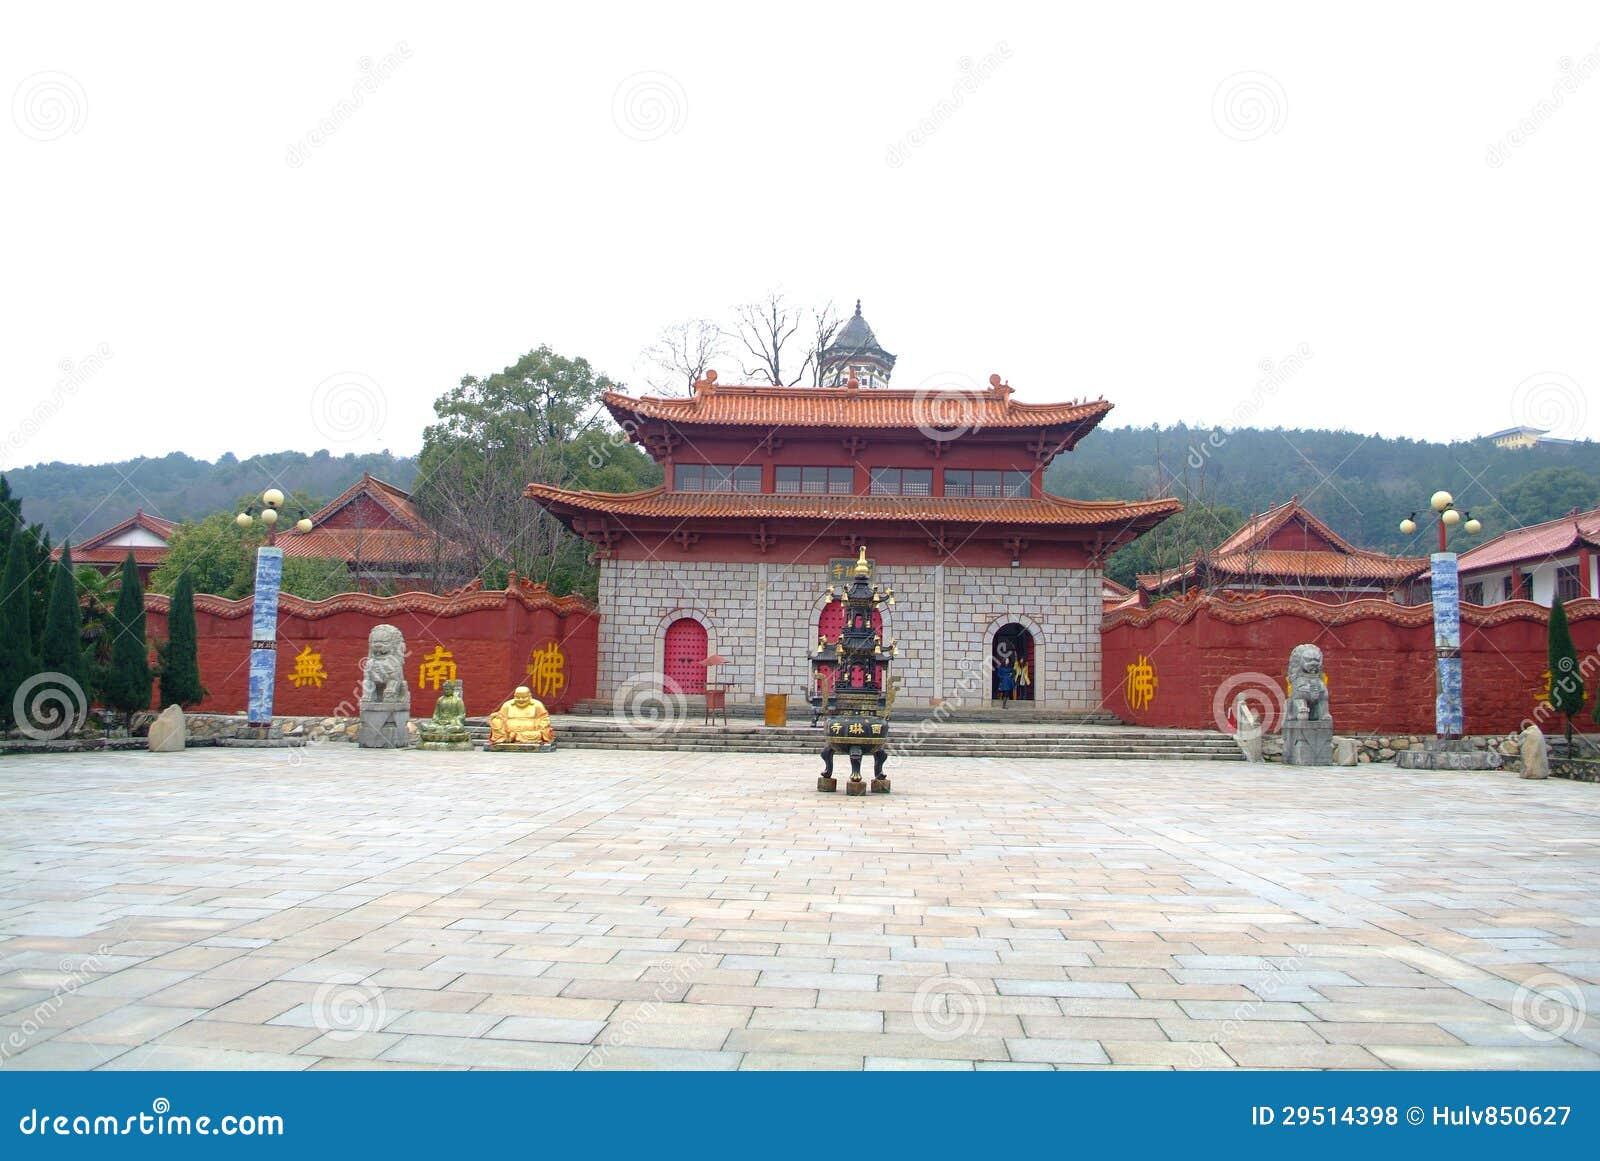 Beroemdste tempel in China